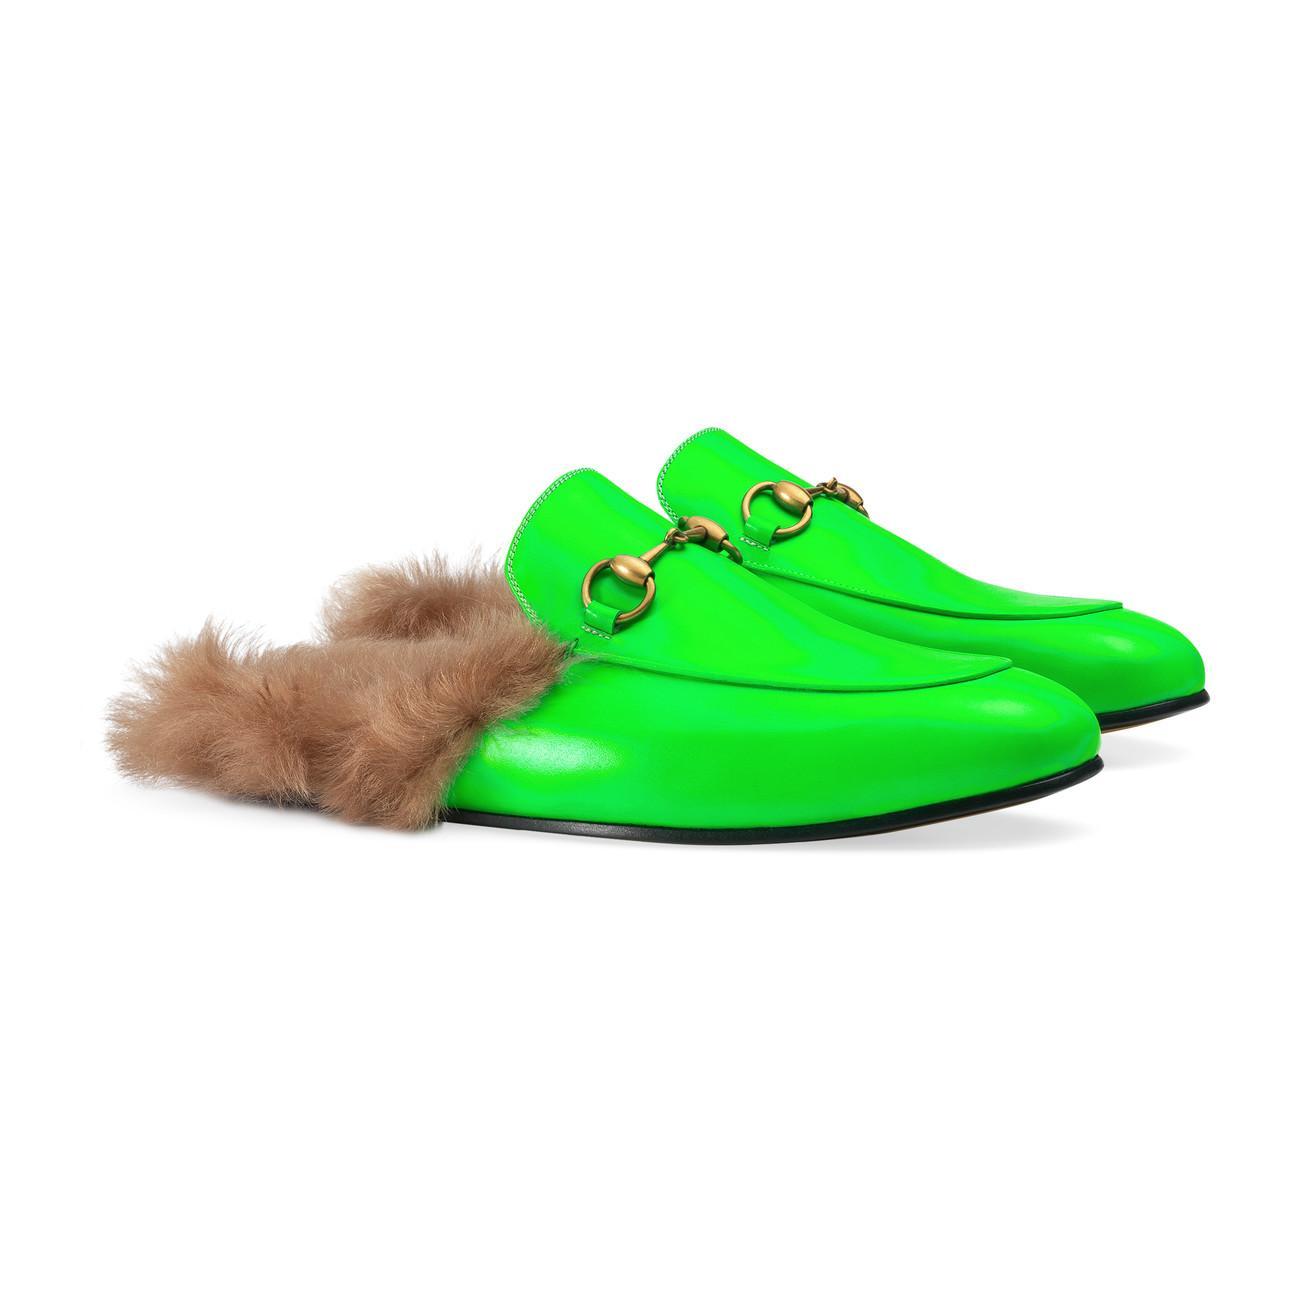 d8a55948fcc Gucci - Green Princetown Fluorescent Leather Slipper for Men - Lyst. View  fullscreen